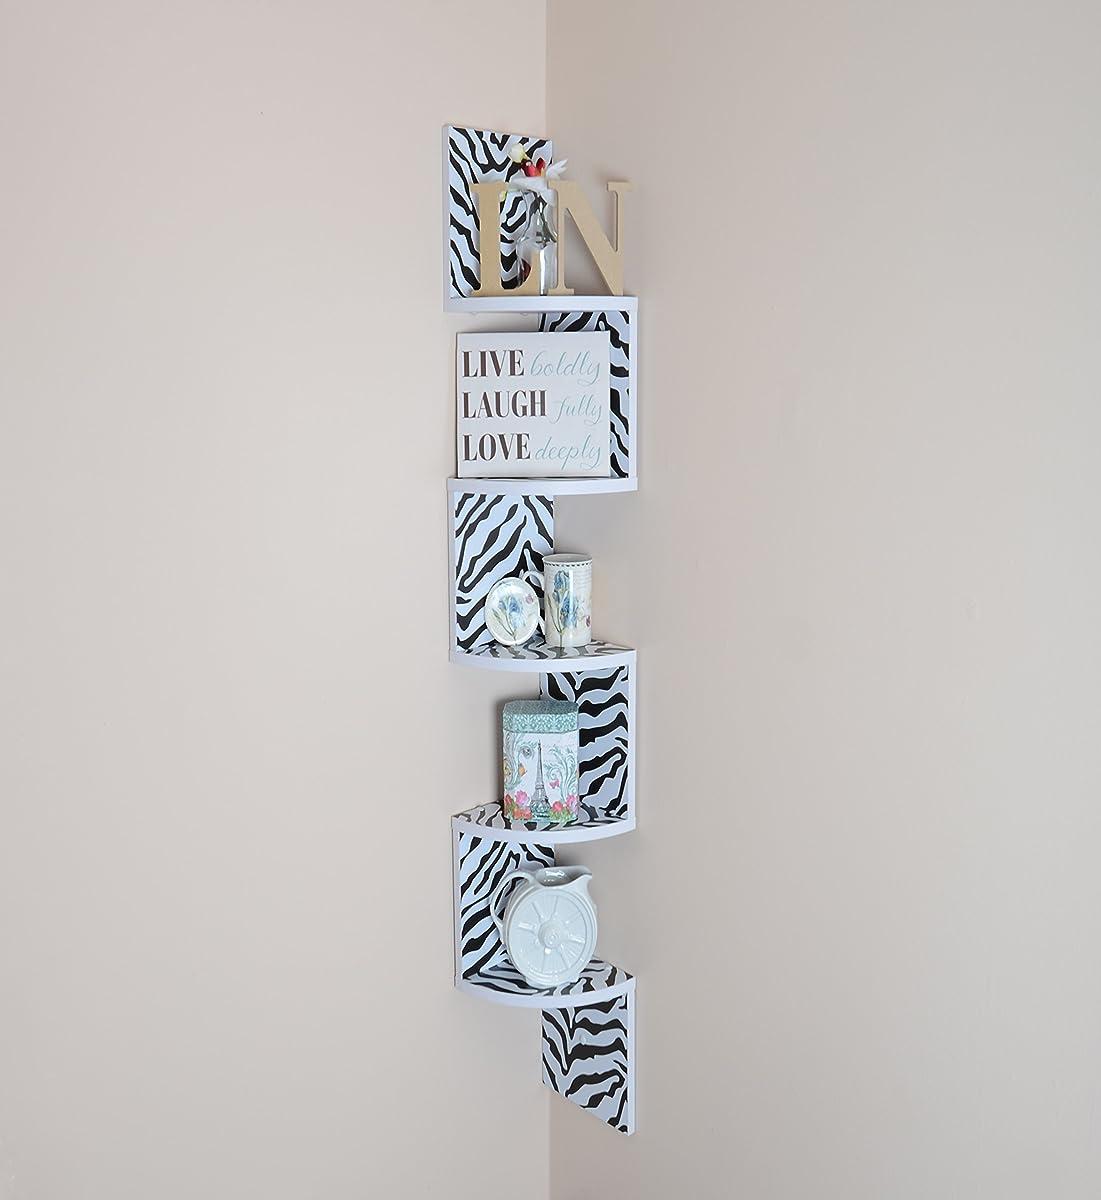 Adorn home essentials| Corner Zig Zag Wall Mount Shelves| 5-Tier, Zebra with White Edging